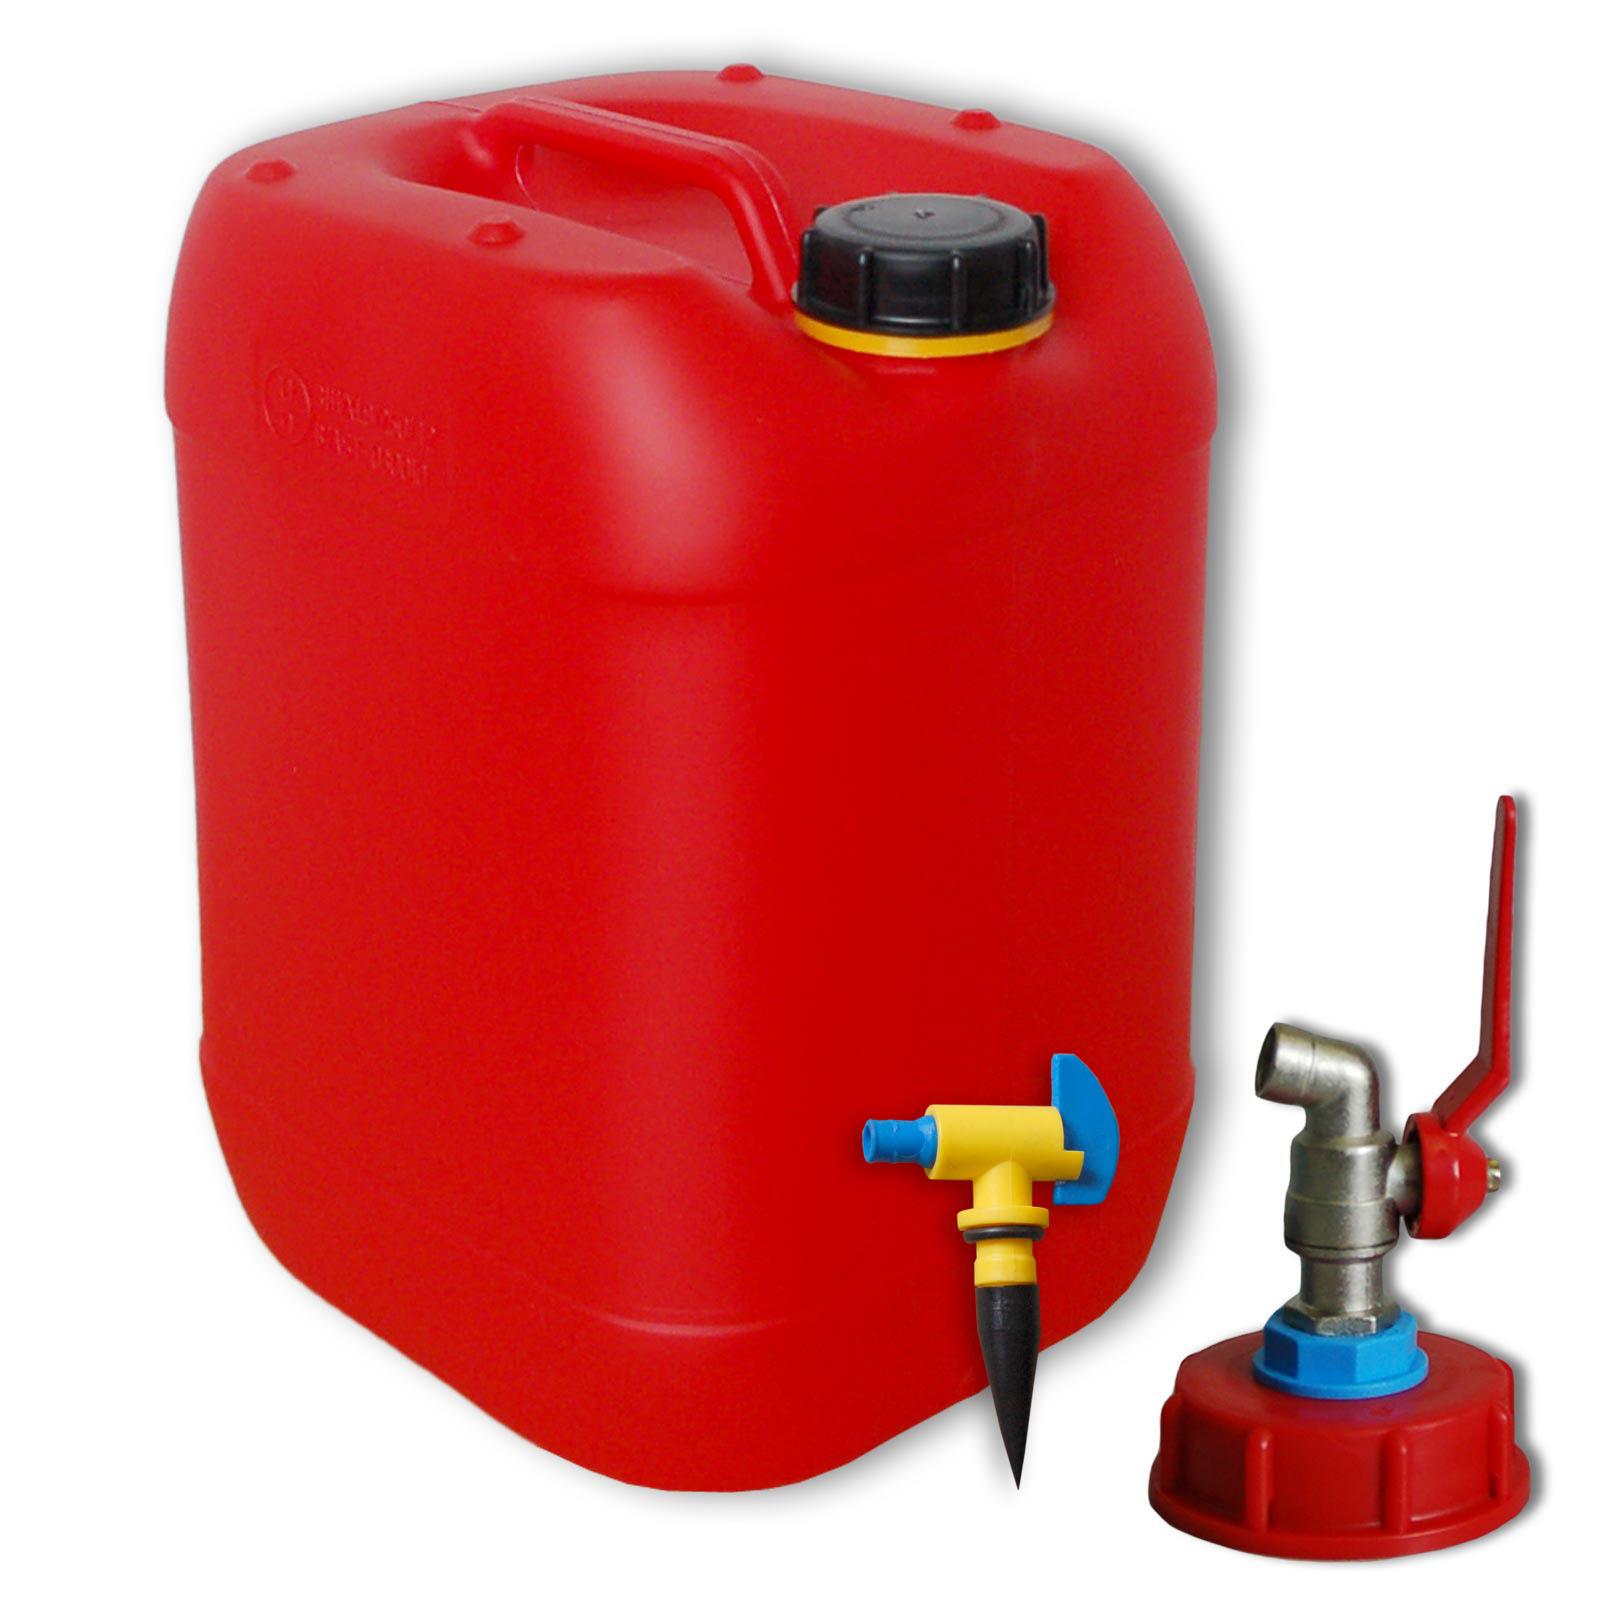 20 liter kanister rot mit metallhahn din 61 und entl ftung. Black Bedroom Furniture Sets. Home Design Ideas